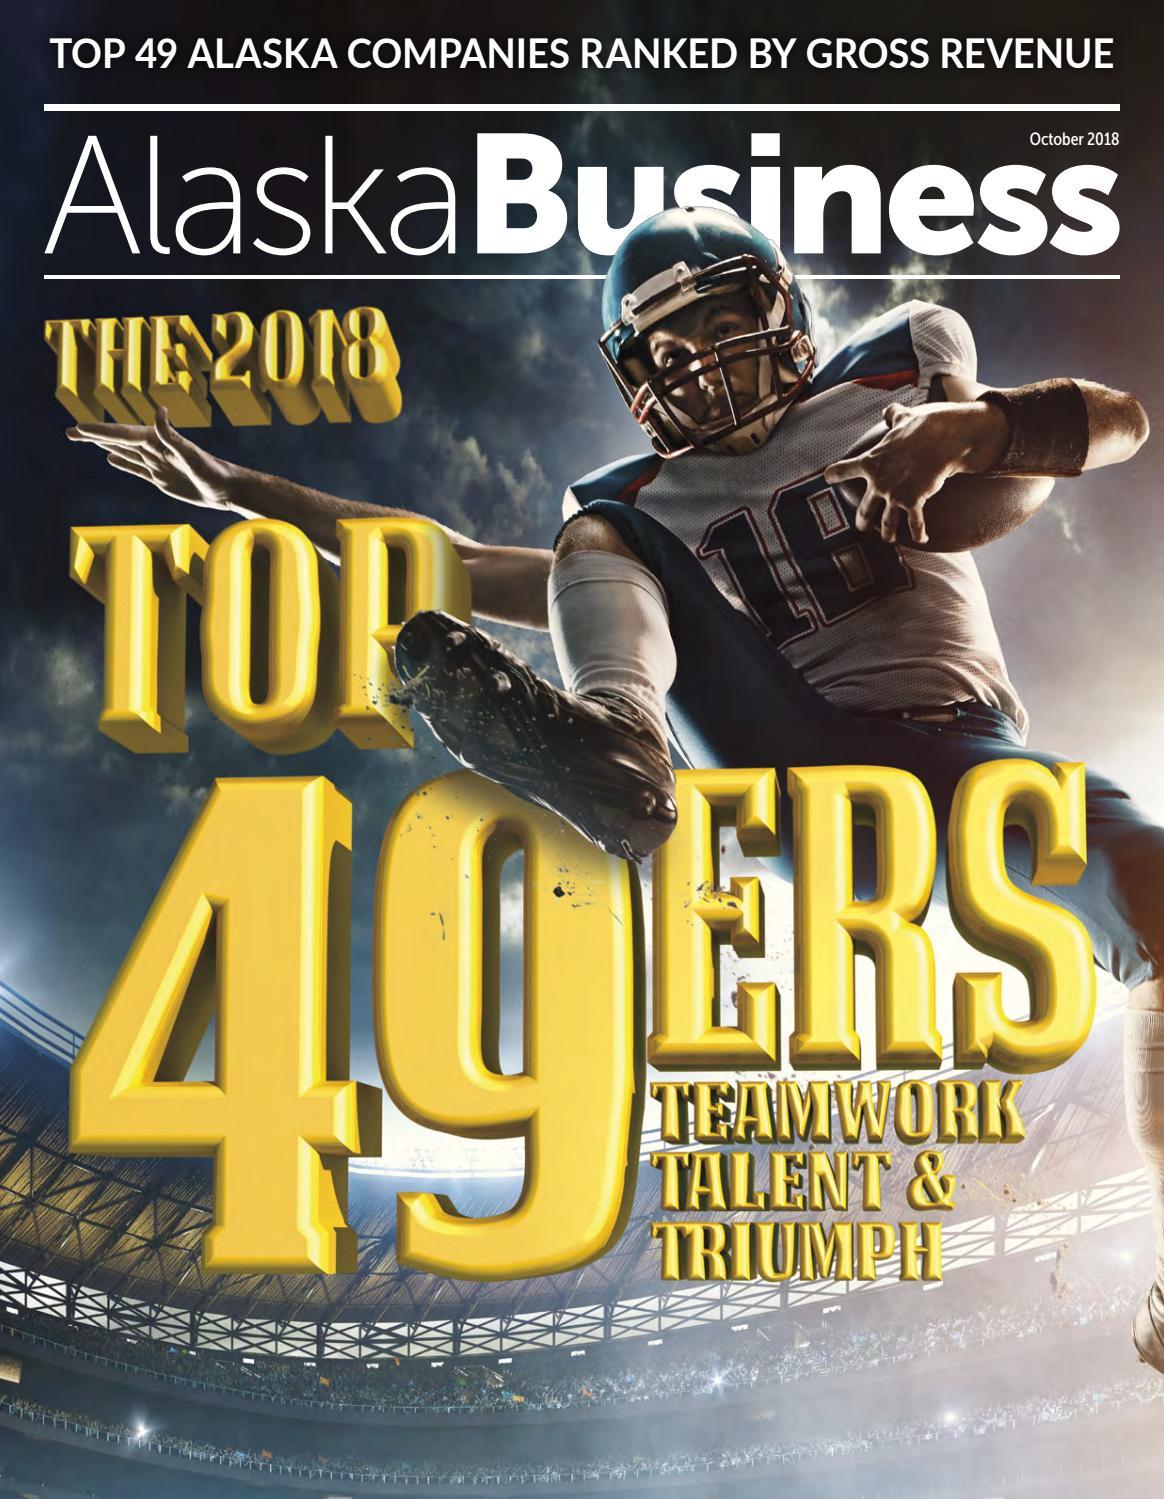 Alaska Business October 2018 by Alaska Business - issuu